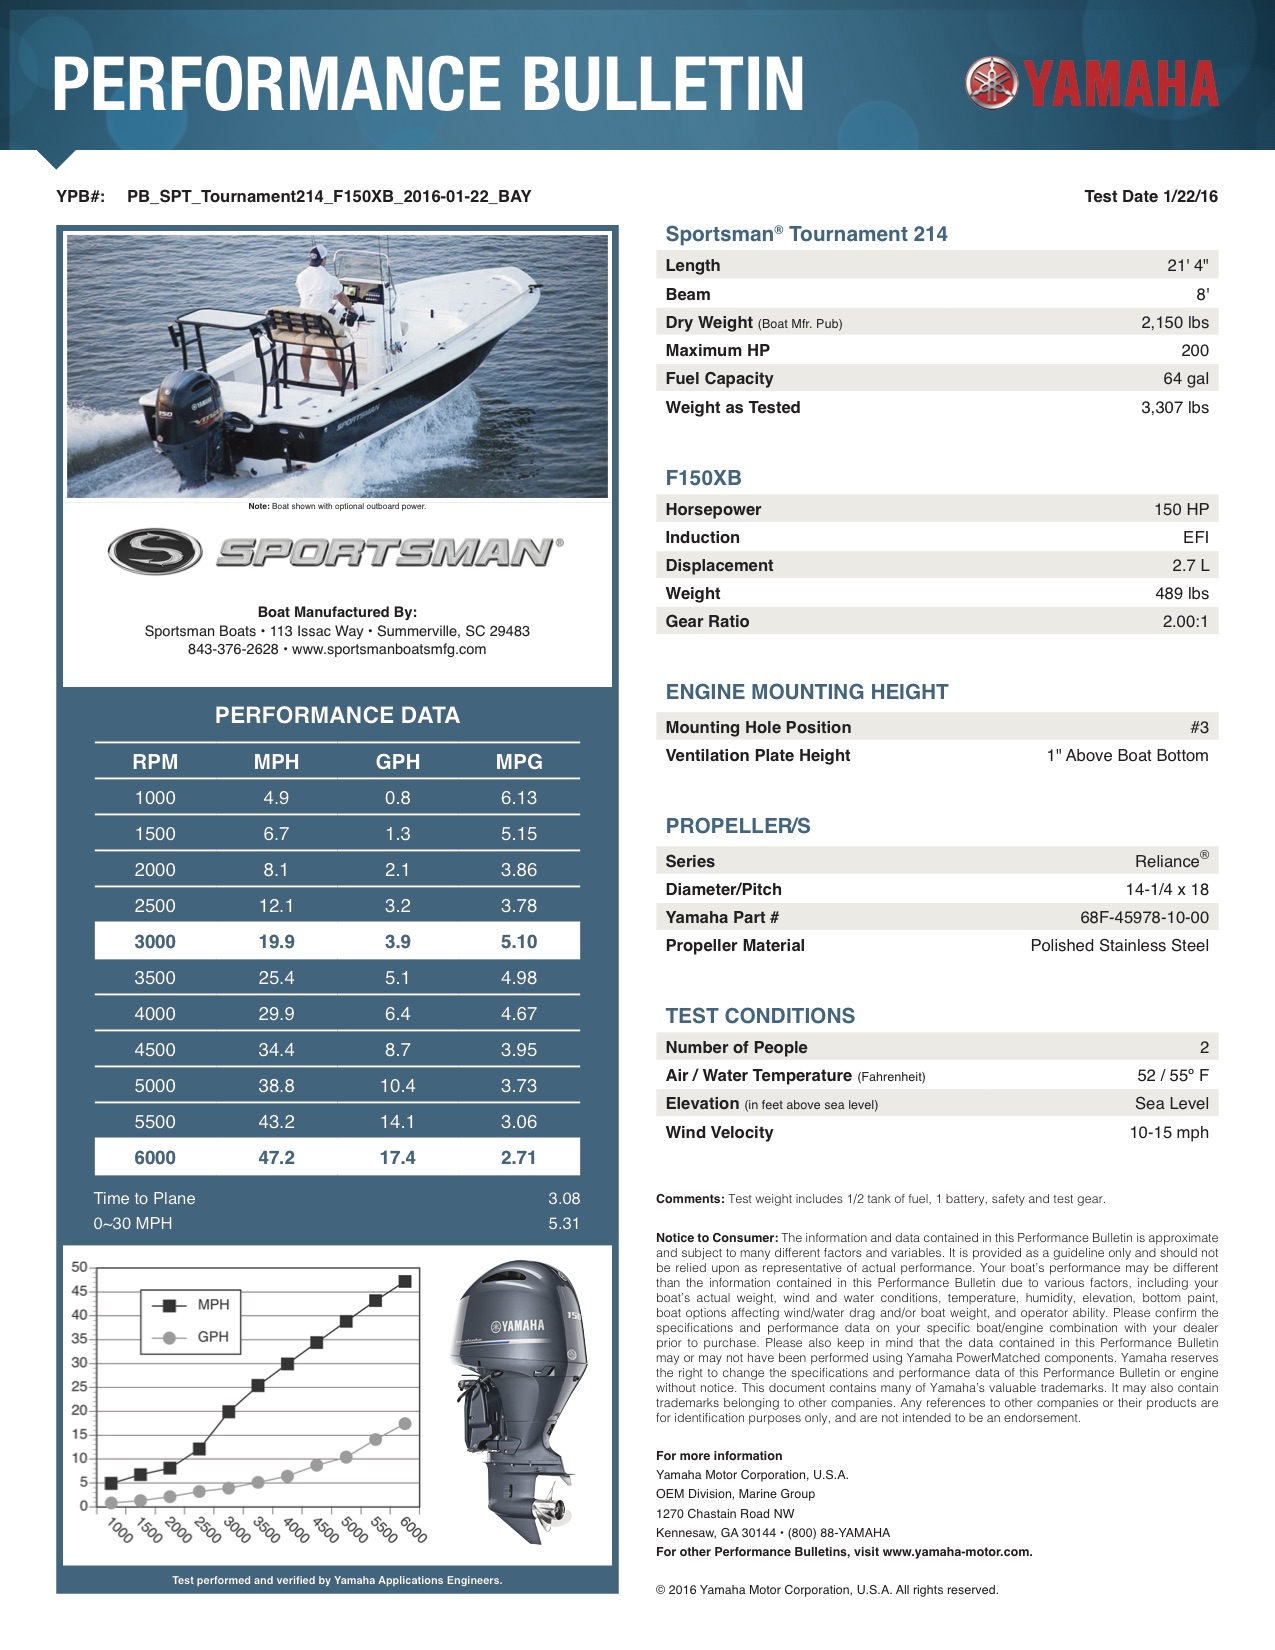 Performance bulletin for 214-bay-boat